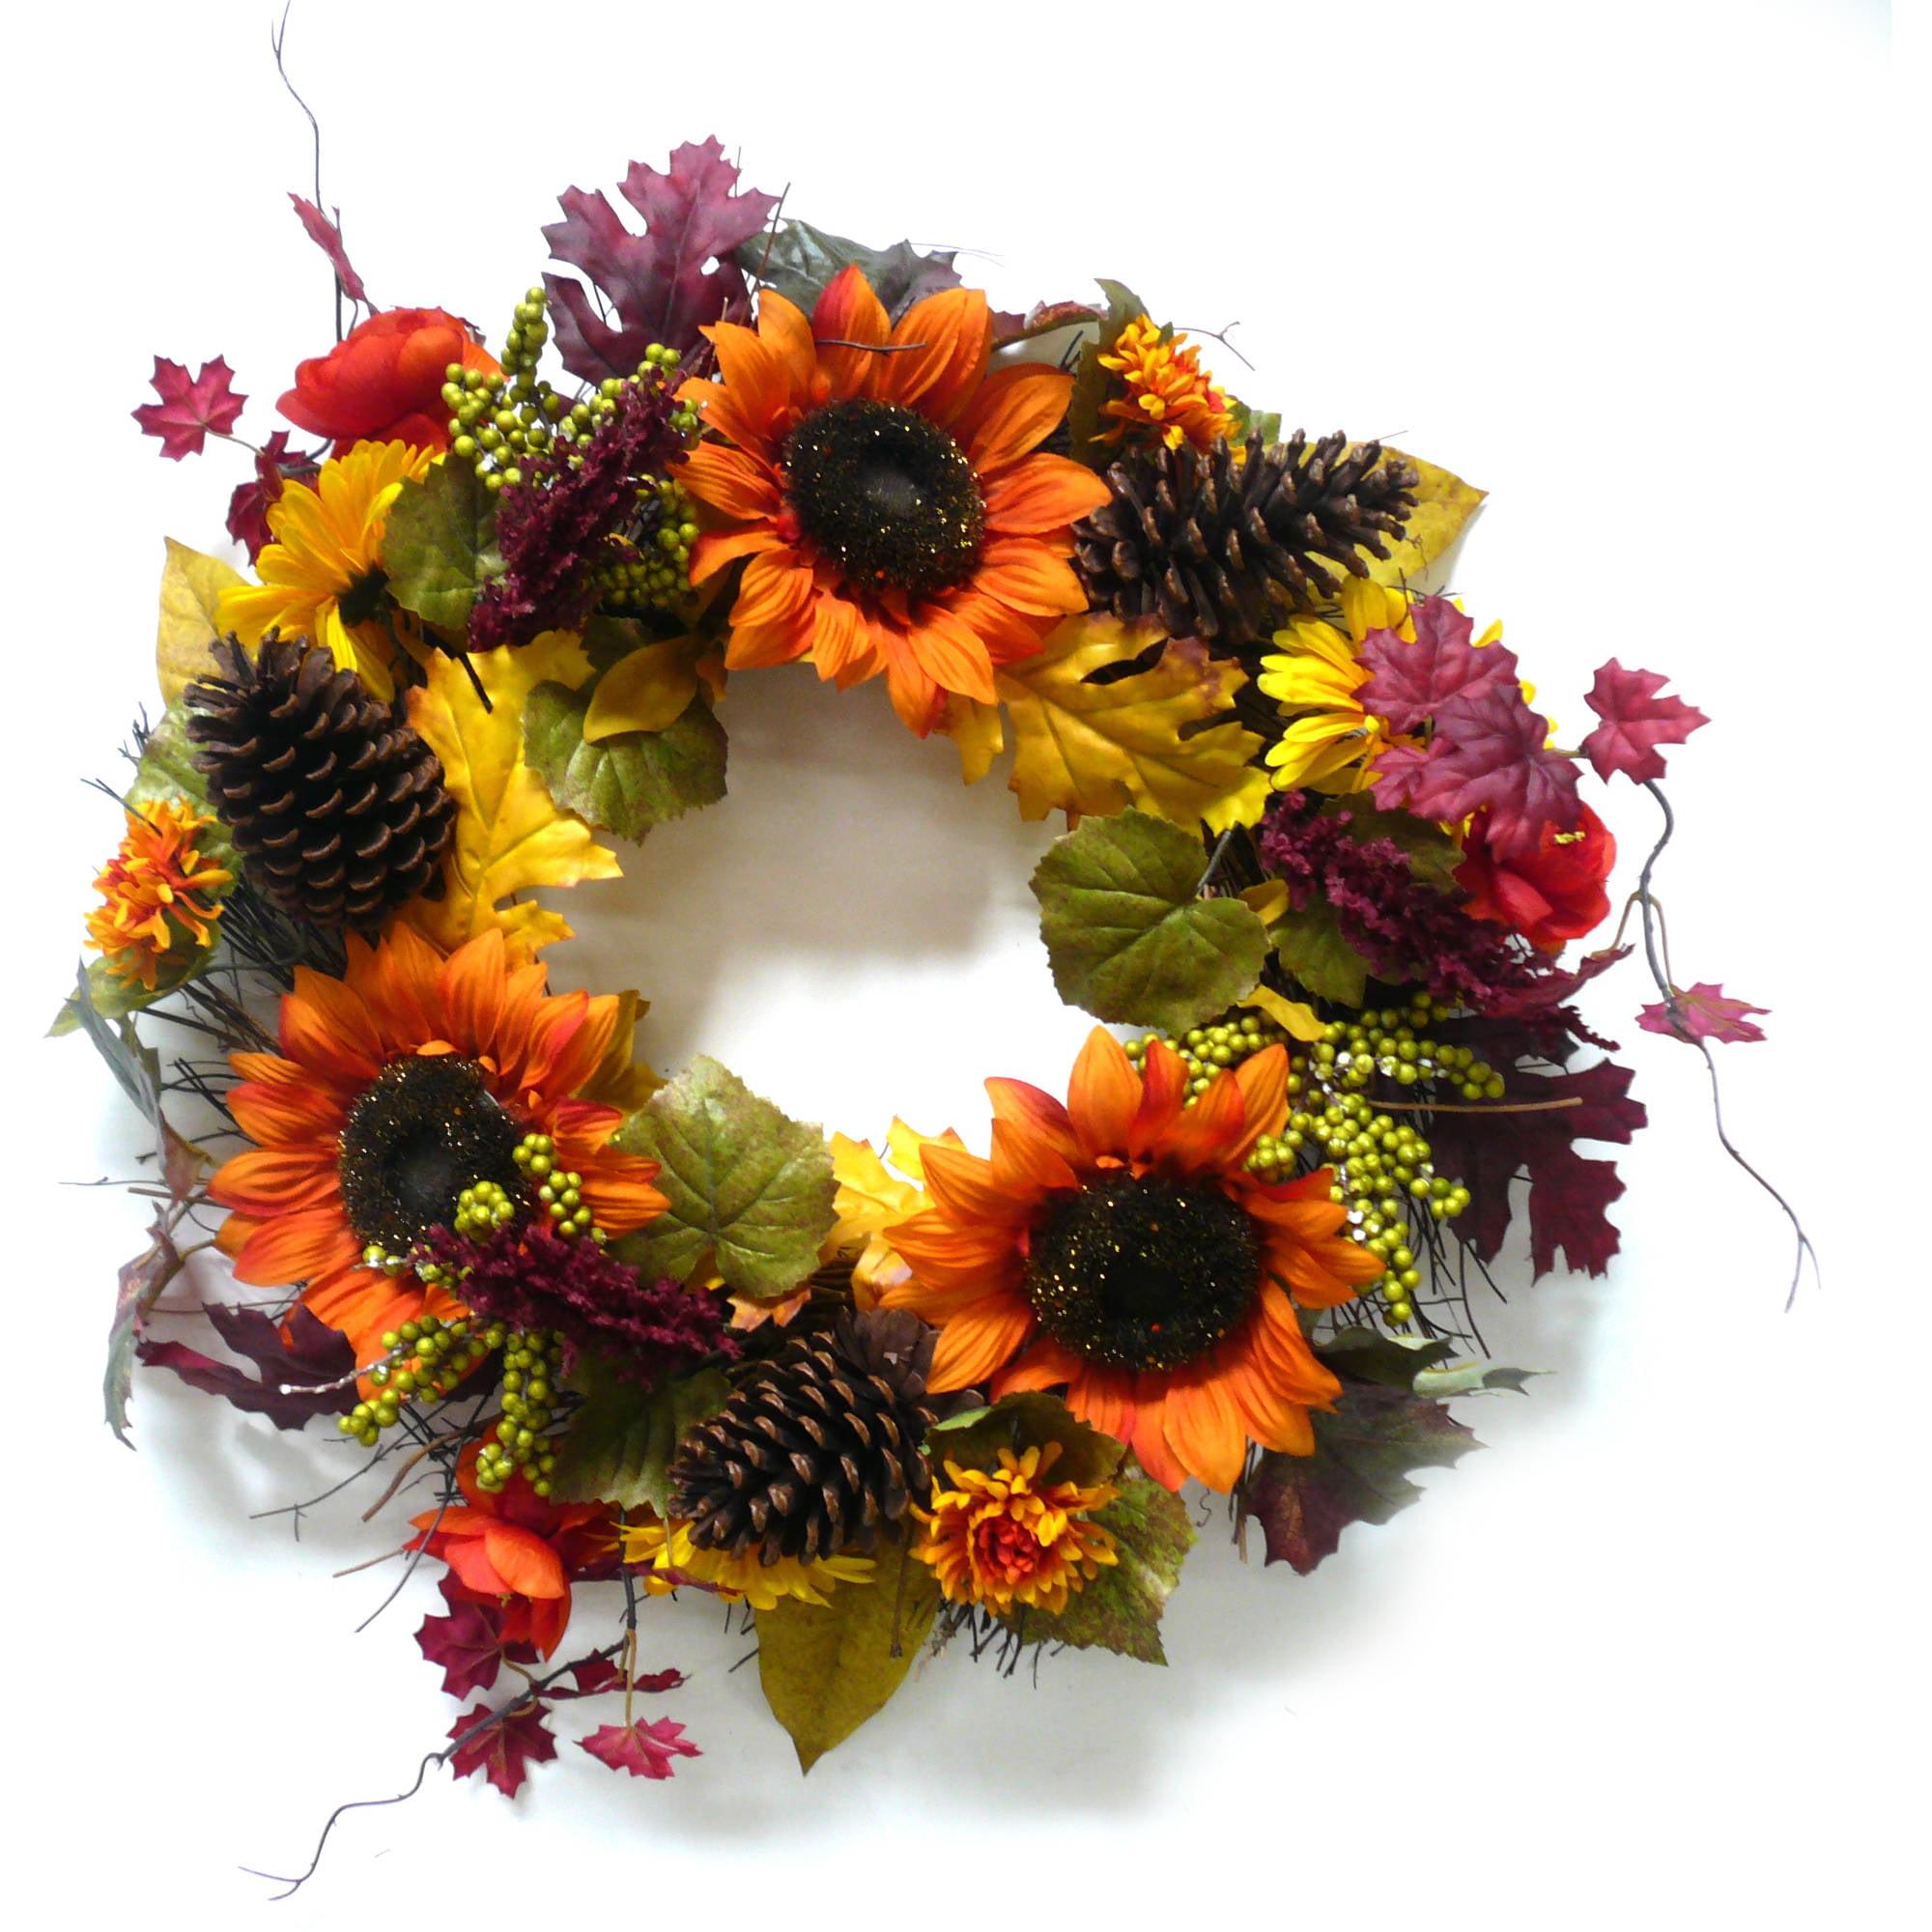 Orange Sunflower Mixed Harvest Wreath